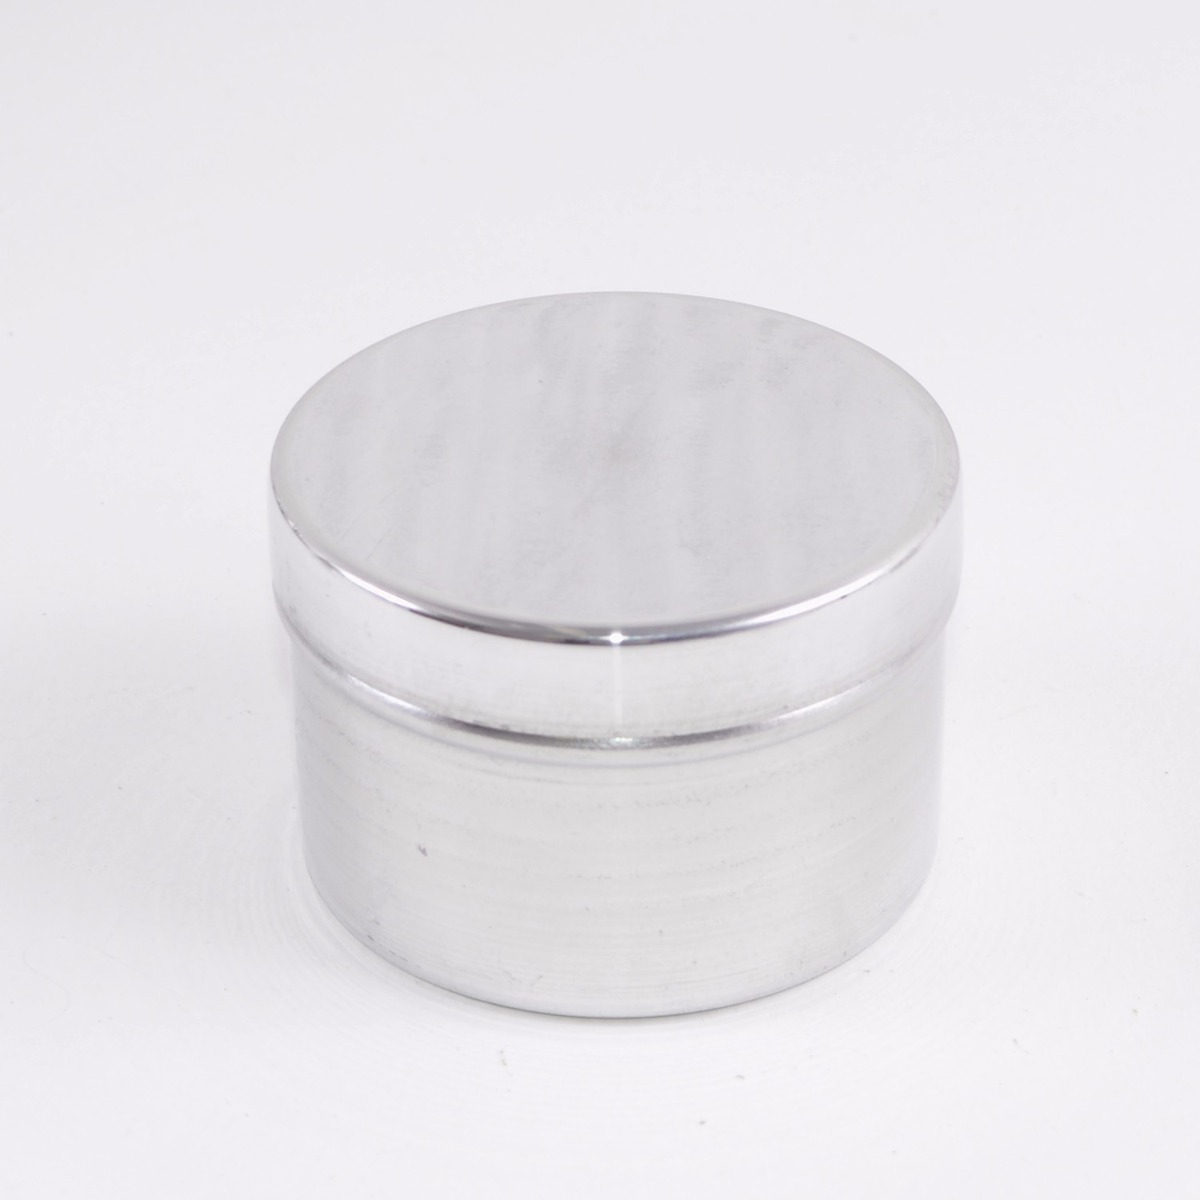 Caixa 12 Unidades Lata Estojotampa Alumínio Prata Lembrança R 78